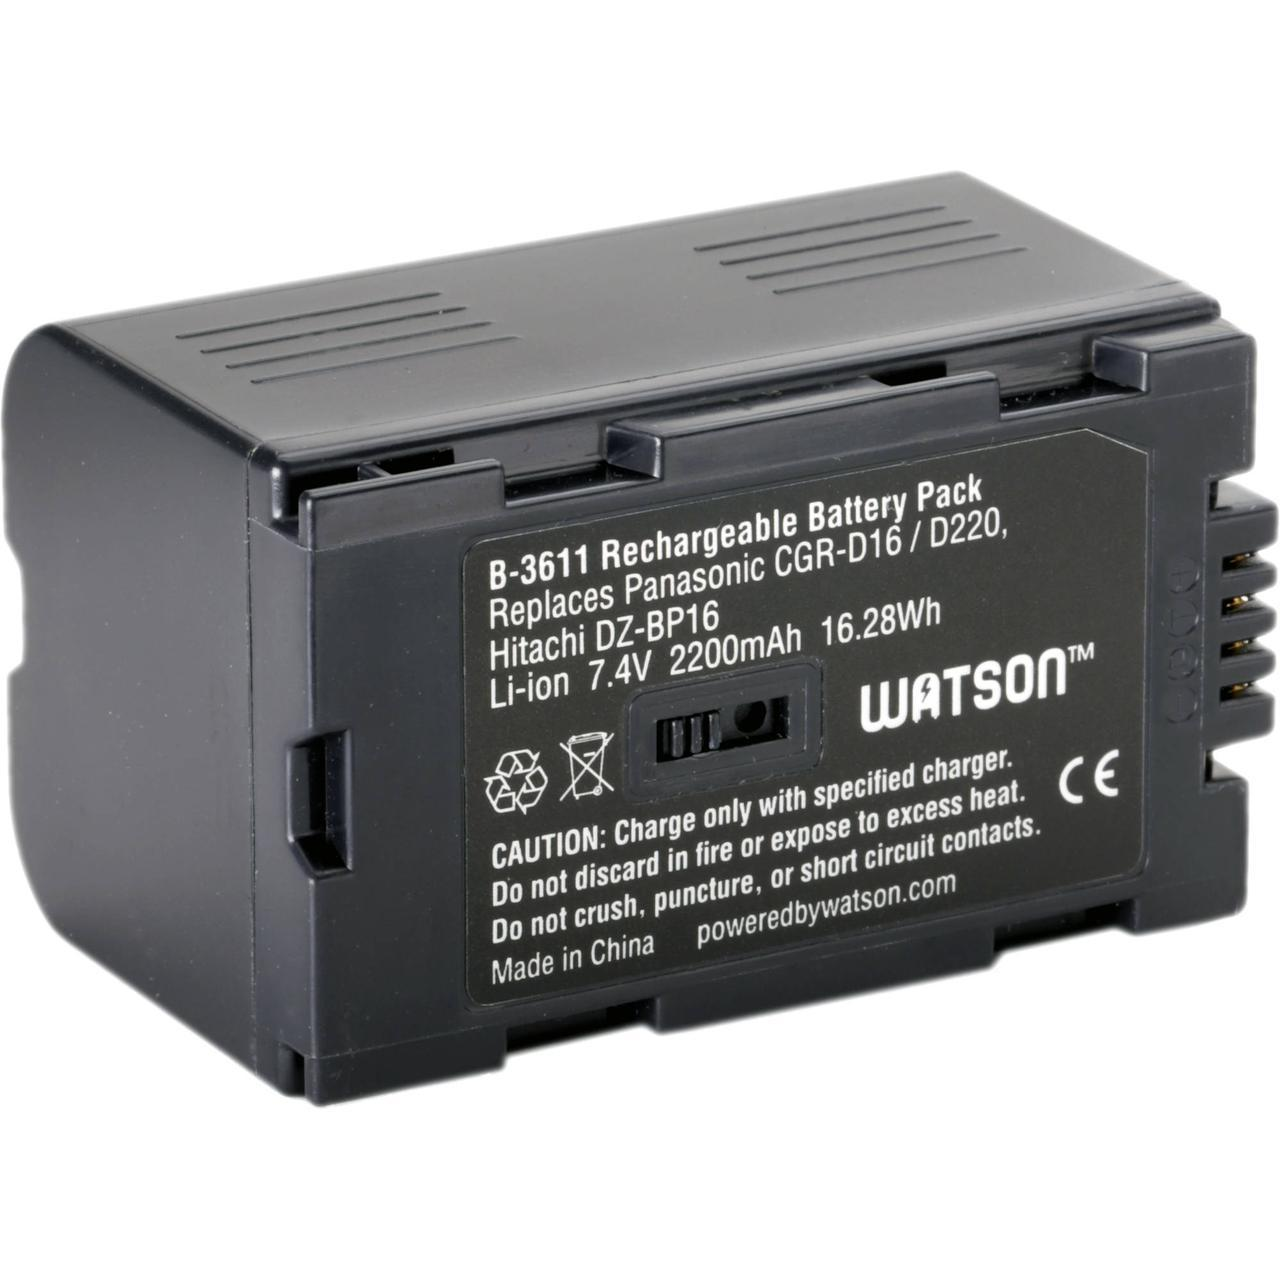 Аккумулятор Panasonic CGR-D16S (1600 mAh)